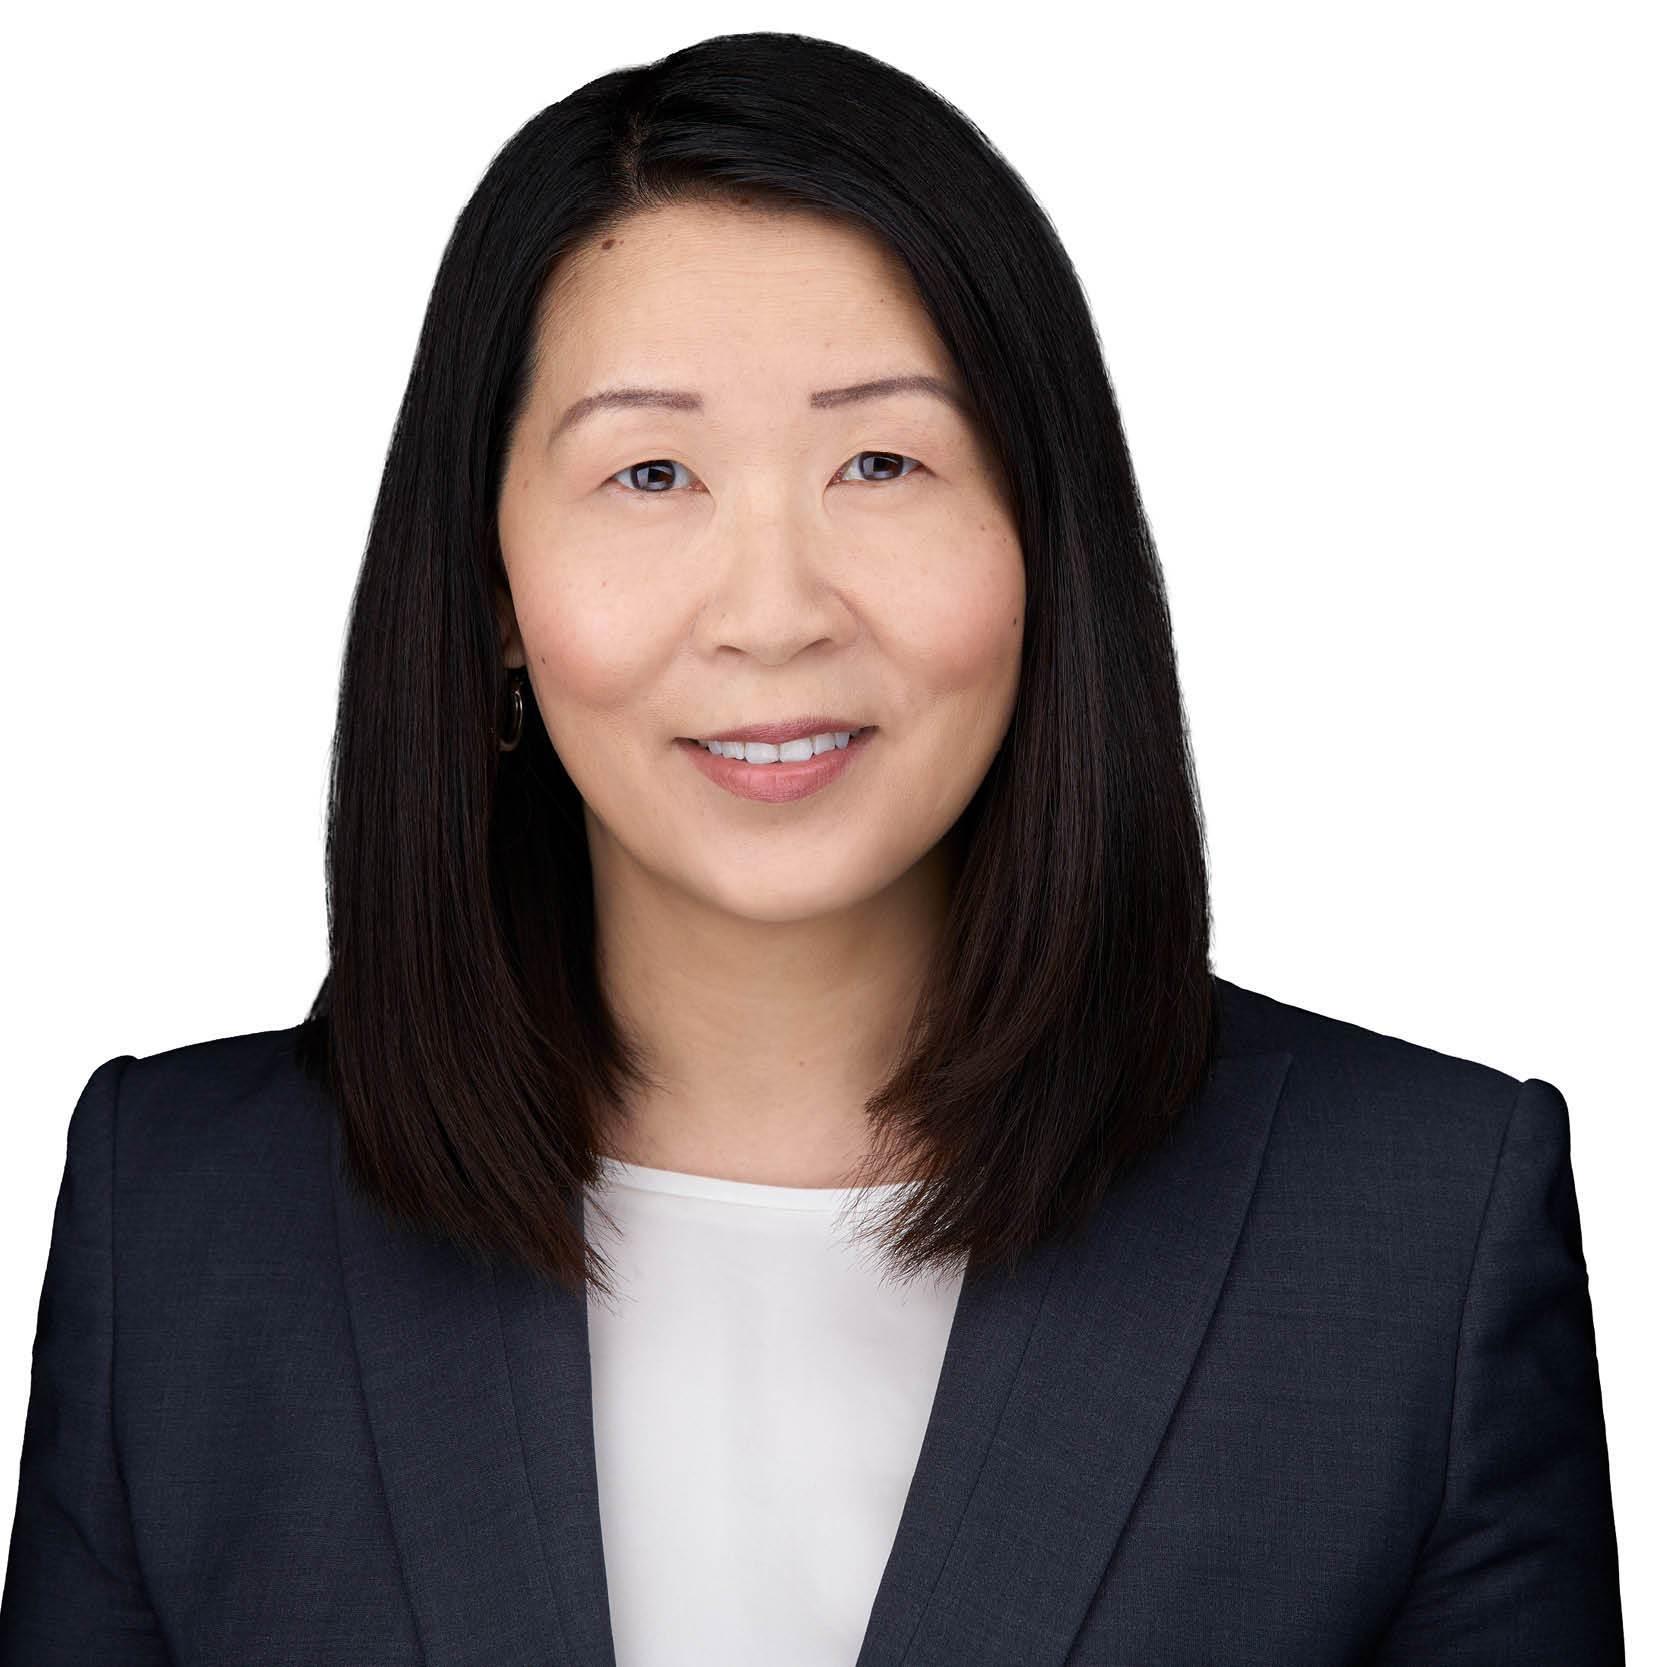 Wendy Parr - TD Wealth Private Investment Advice - Edmonton, AB T5J 2Z1 - (780)448-8095 | ShowMeLocal.com